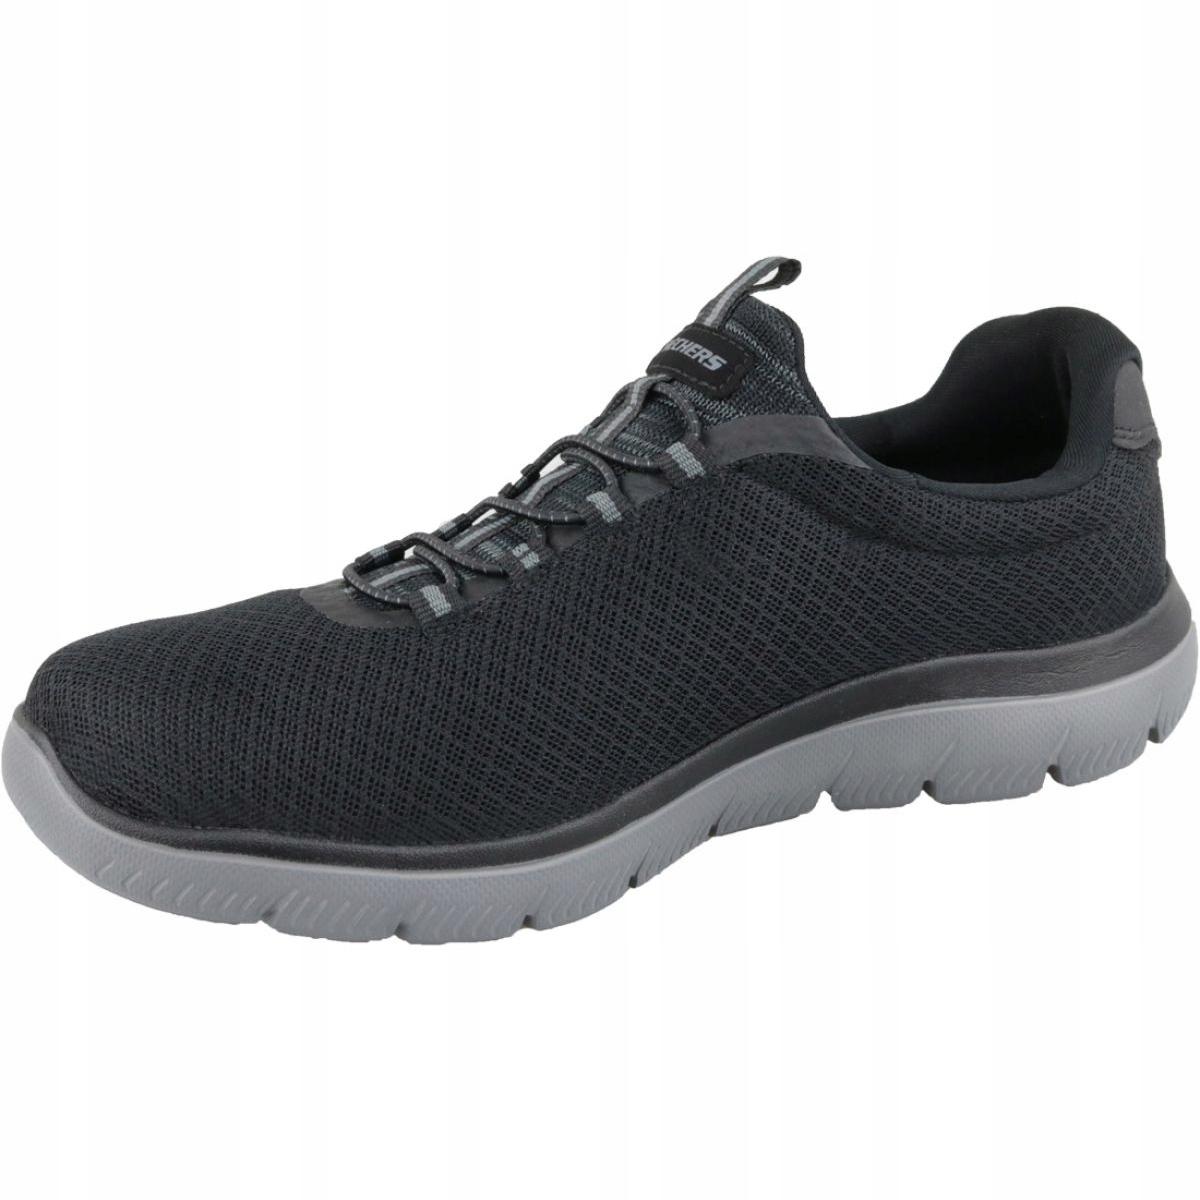 Skechers Summits M 52811-BKCC shoes